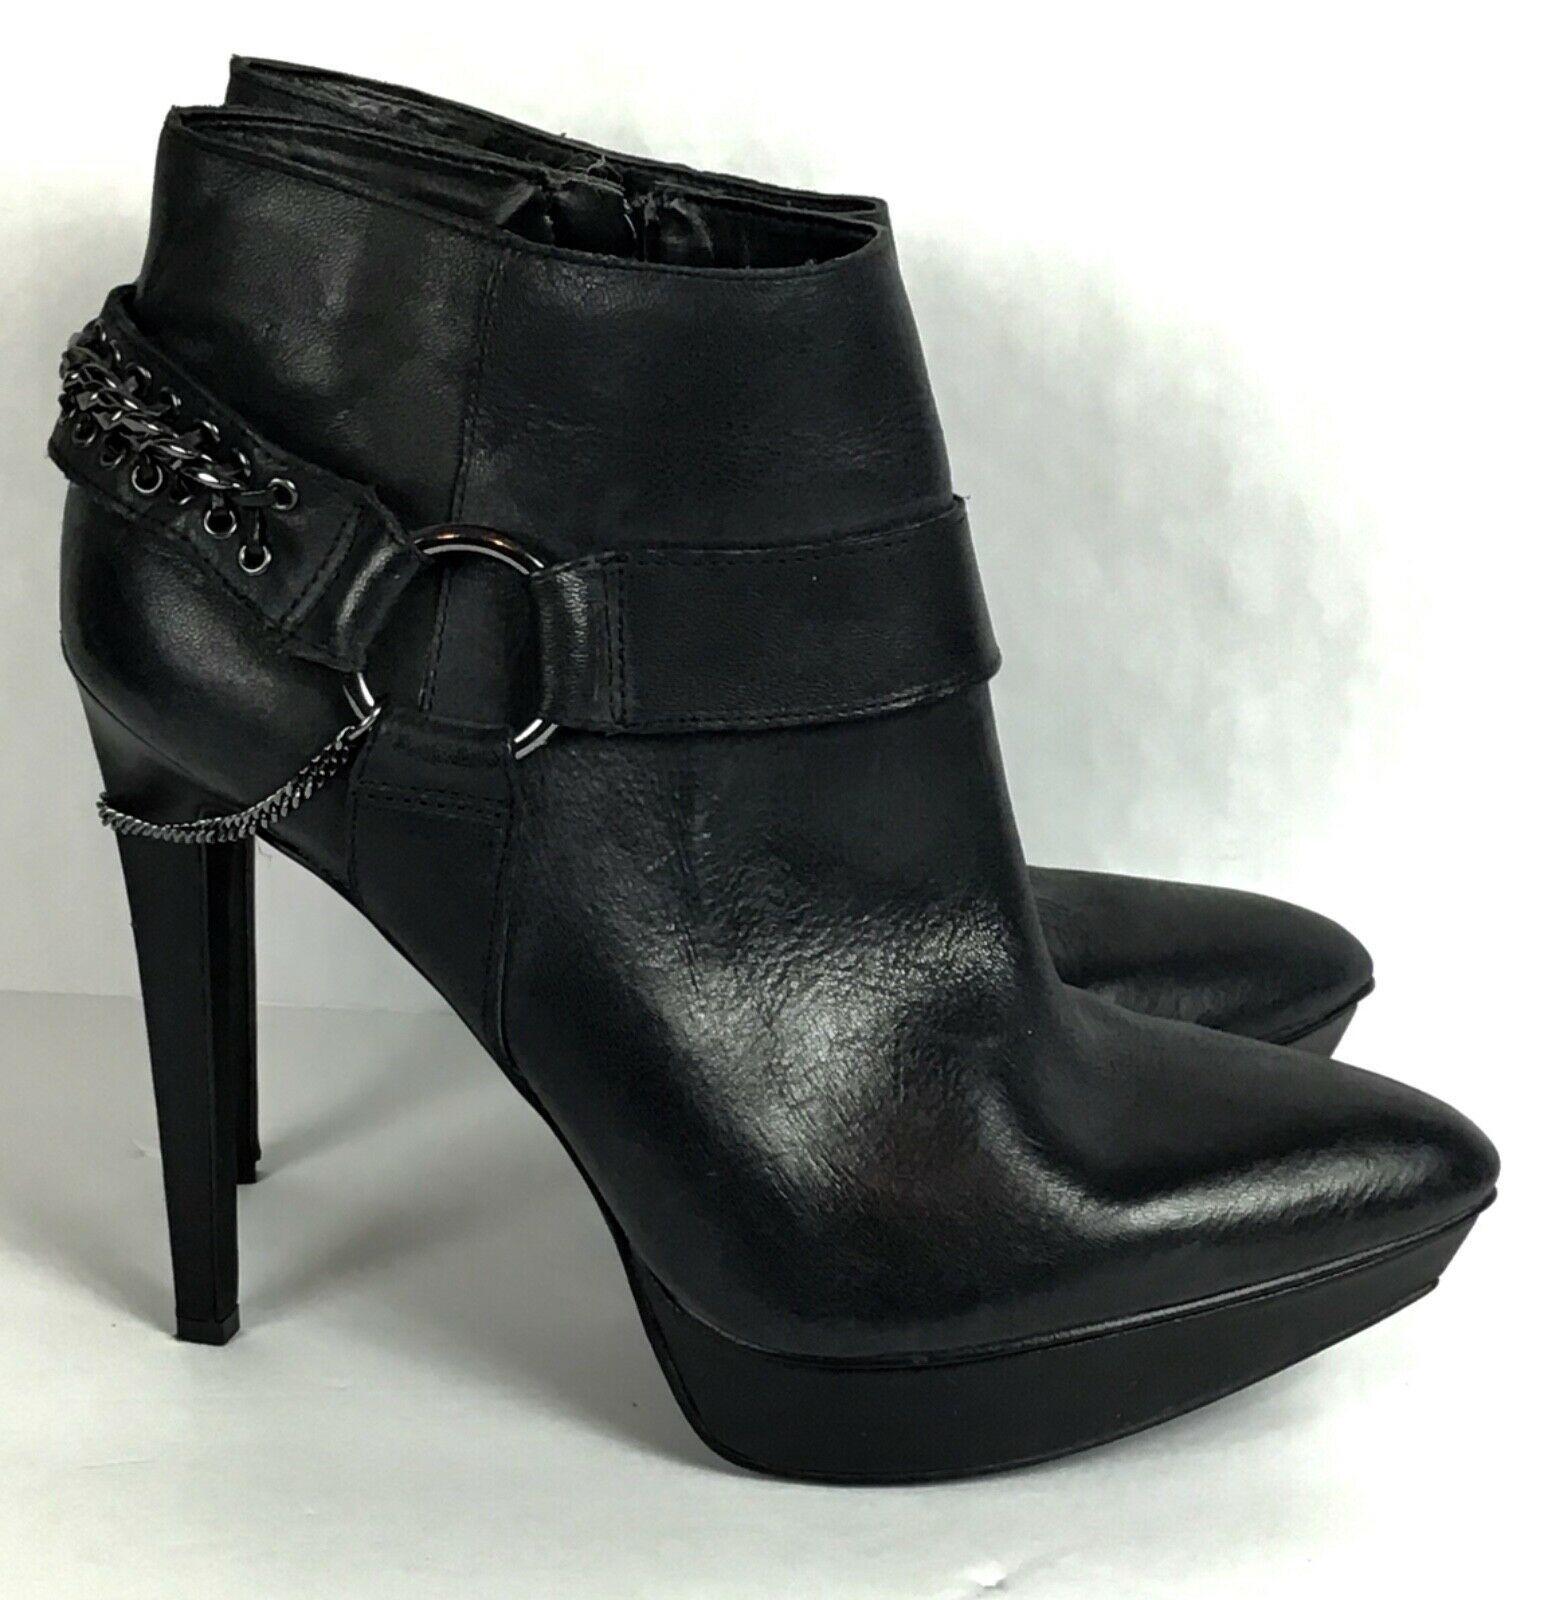 Jessica Simpson Vinata 10M Ankle Bootie Platform Stiletto Heels Chains Side Zip  image 2